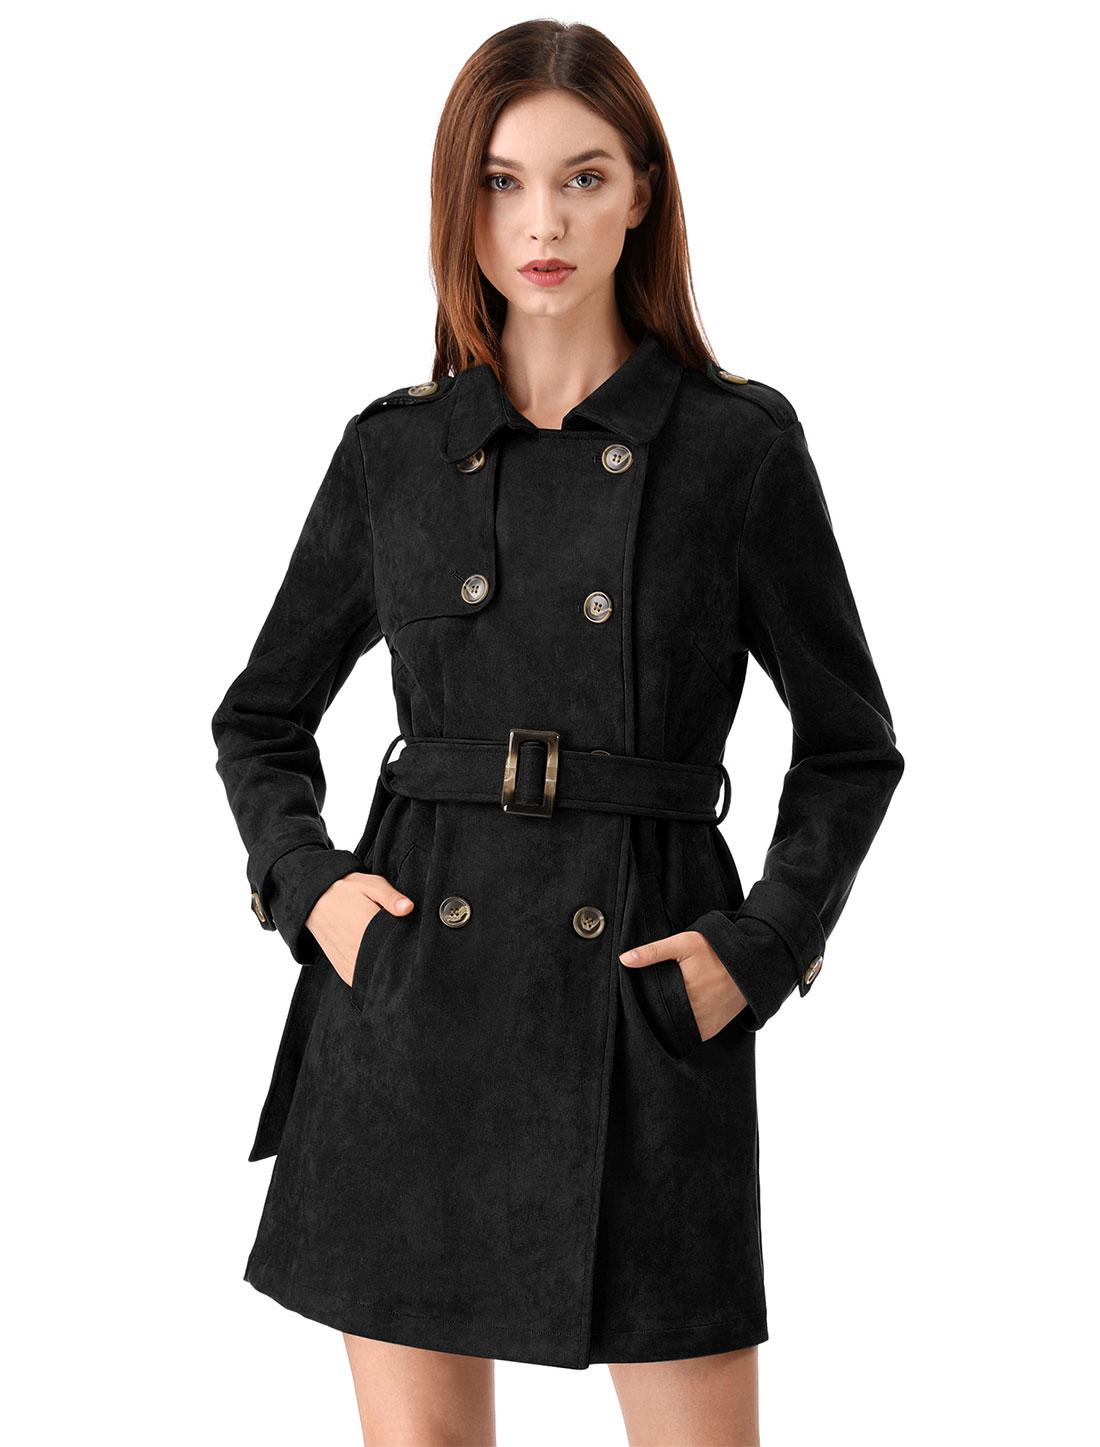 Allegra K Women Faux Suede Trench Coat Jacket with Belt Black M